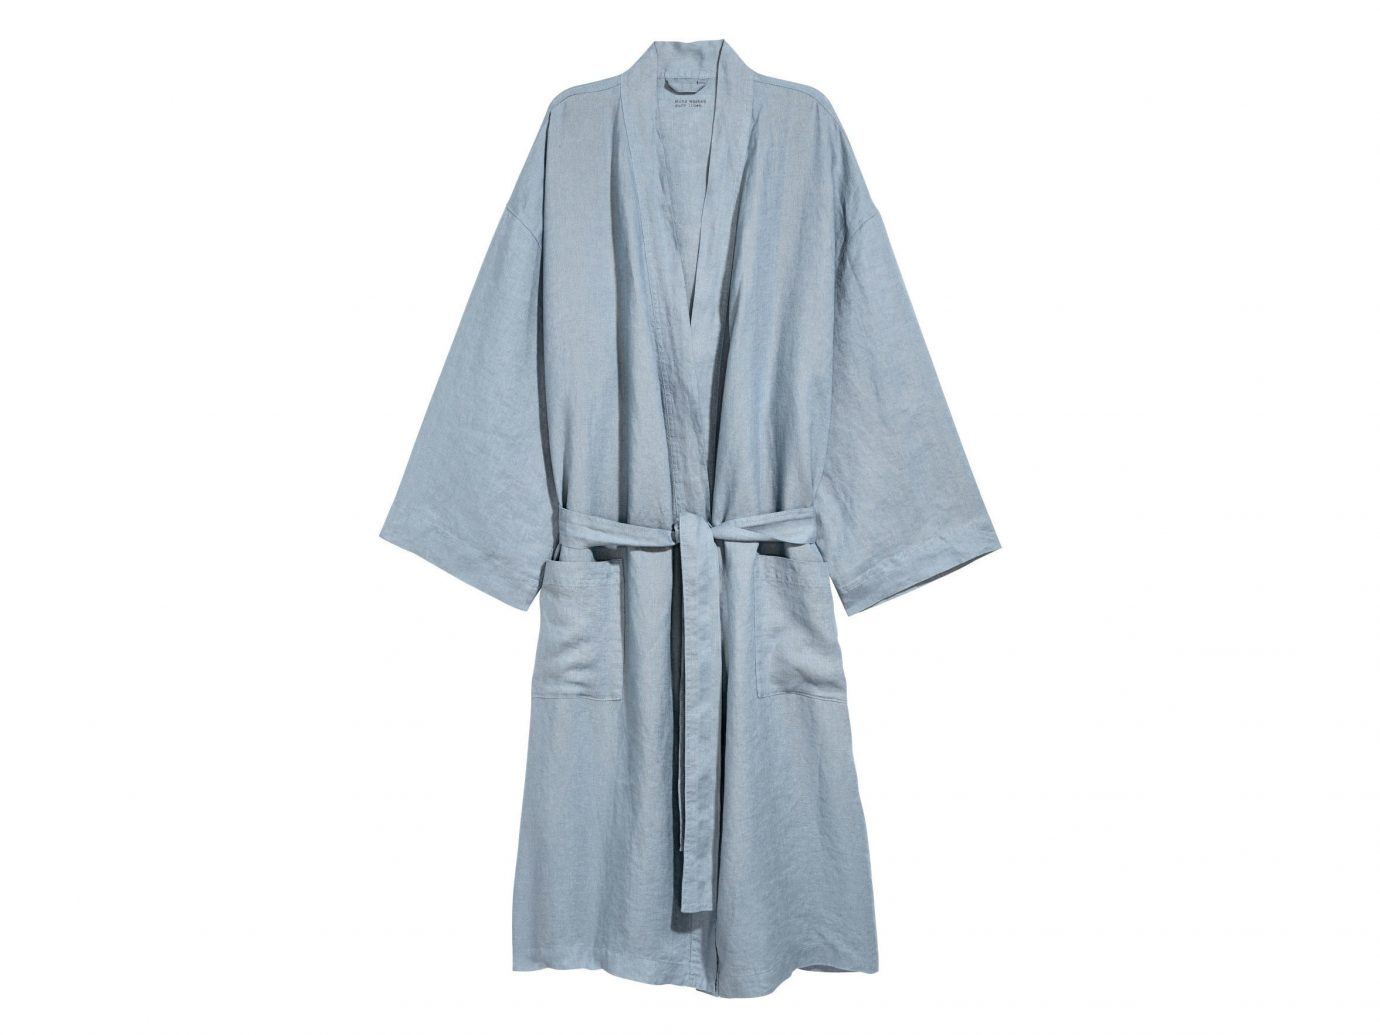 City Copenhagen Kyoto Marrakech Palm Springs Style + Design Travel Shop Tulum clothing robe day dress dress nightwear clothes hanger sleeve